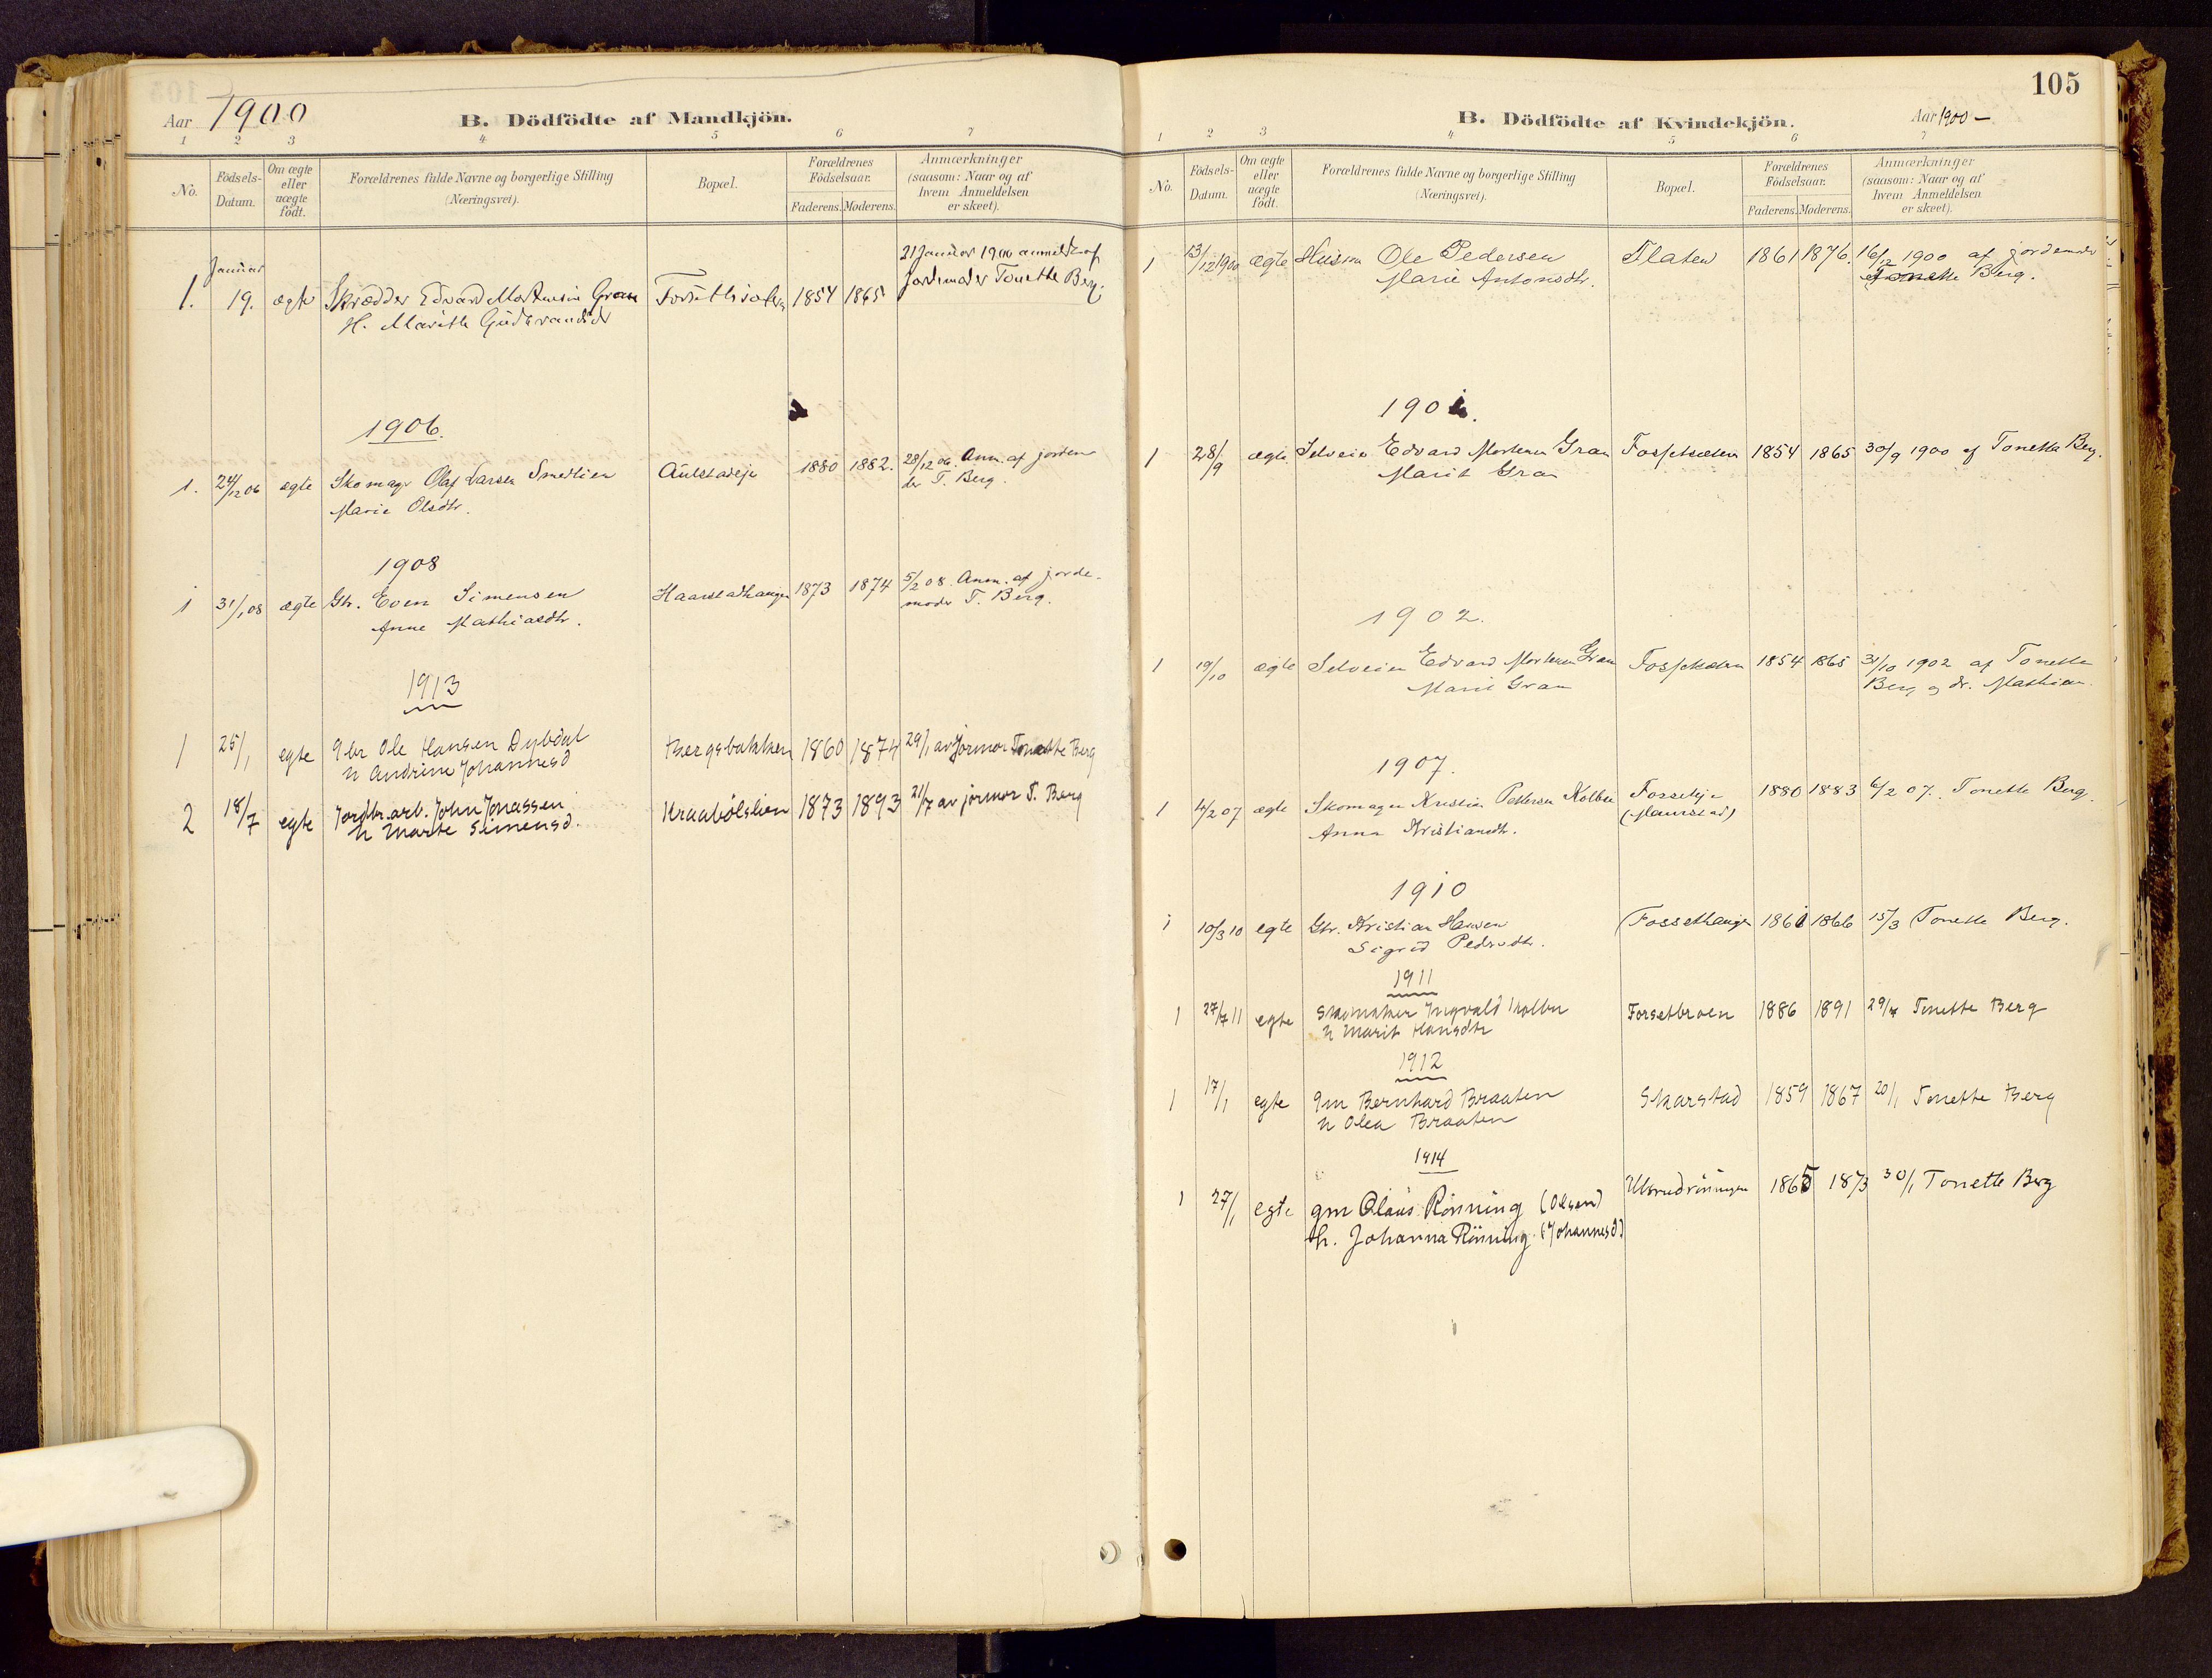 SAH, Vestre Gausdal prestekontor, Ministerialbok nr. 1, 1887-1914, s. 105